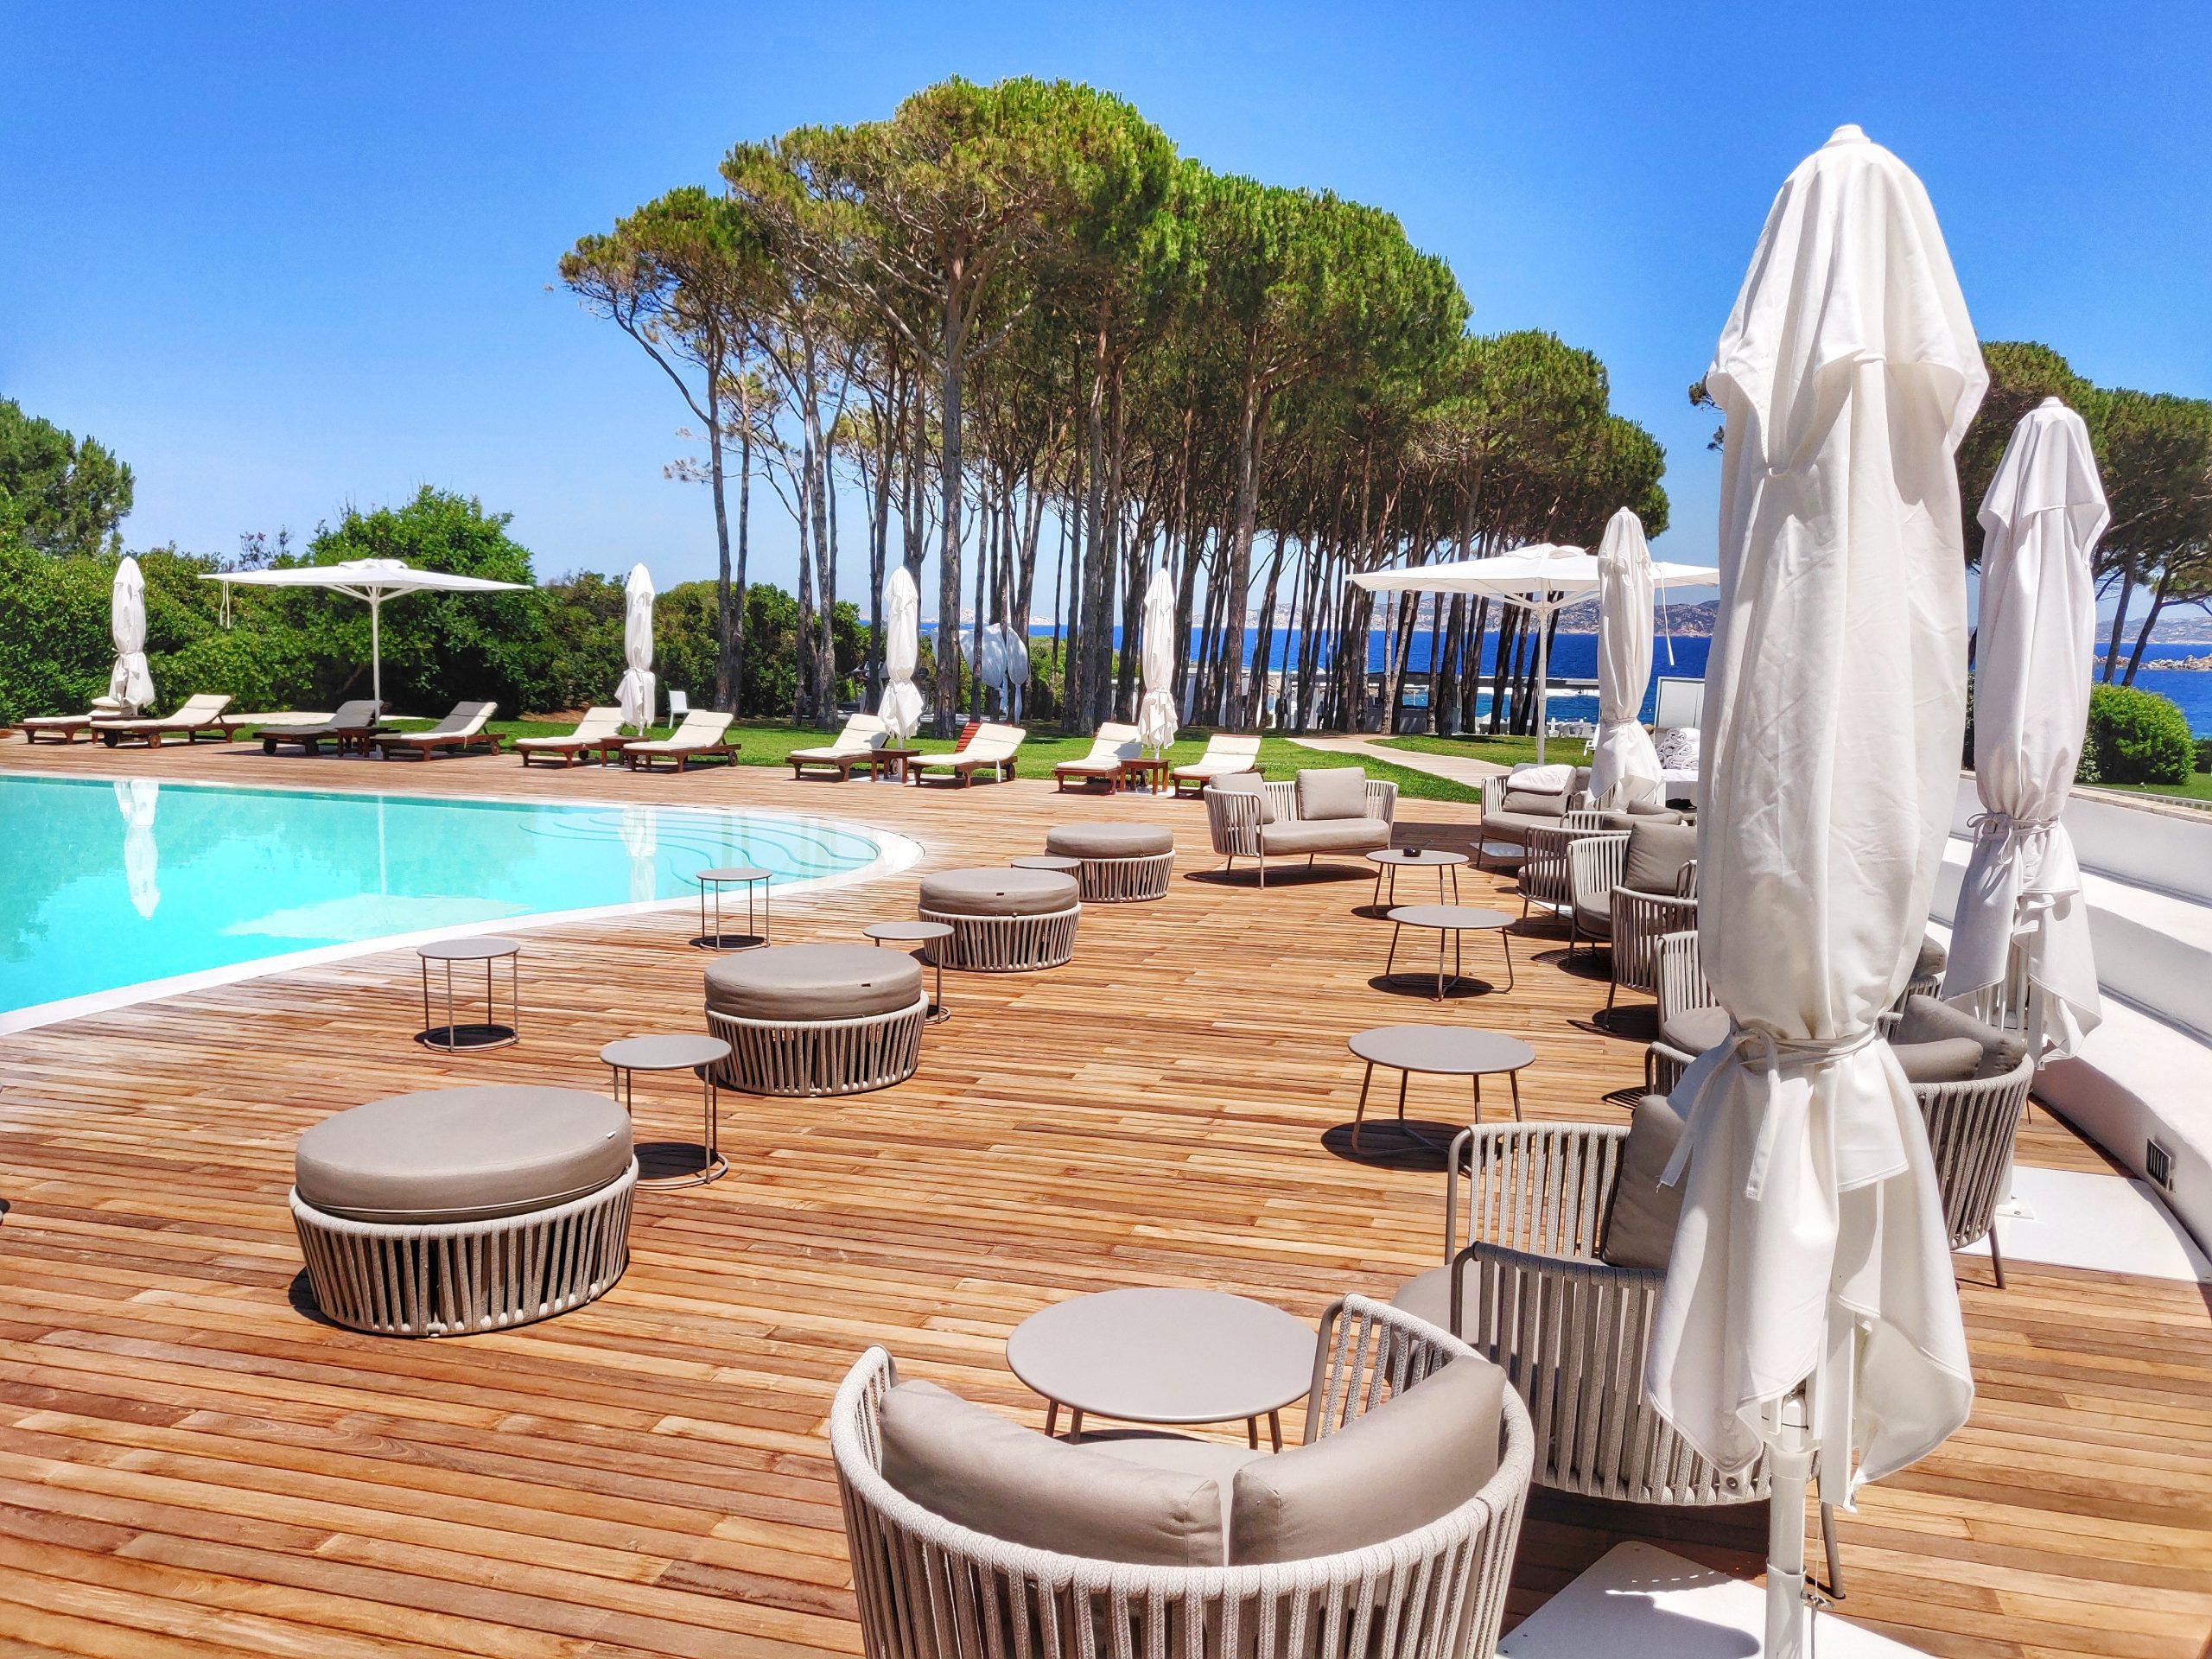 gruppo-felix-hotels-la-coluccia-ambienti-piscina-4